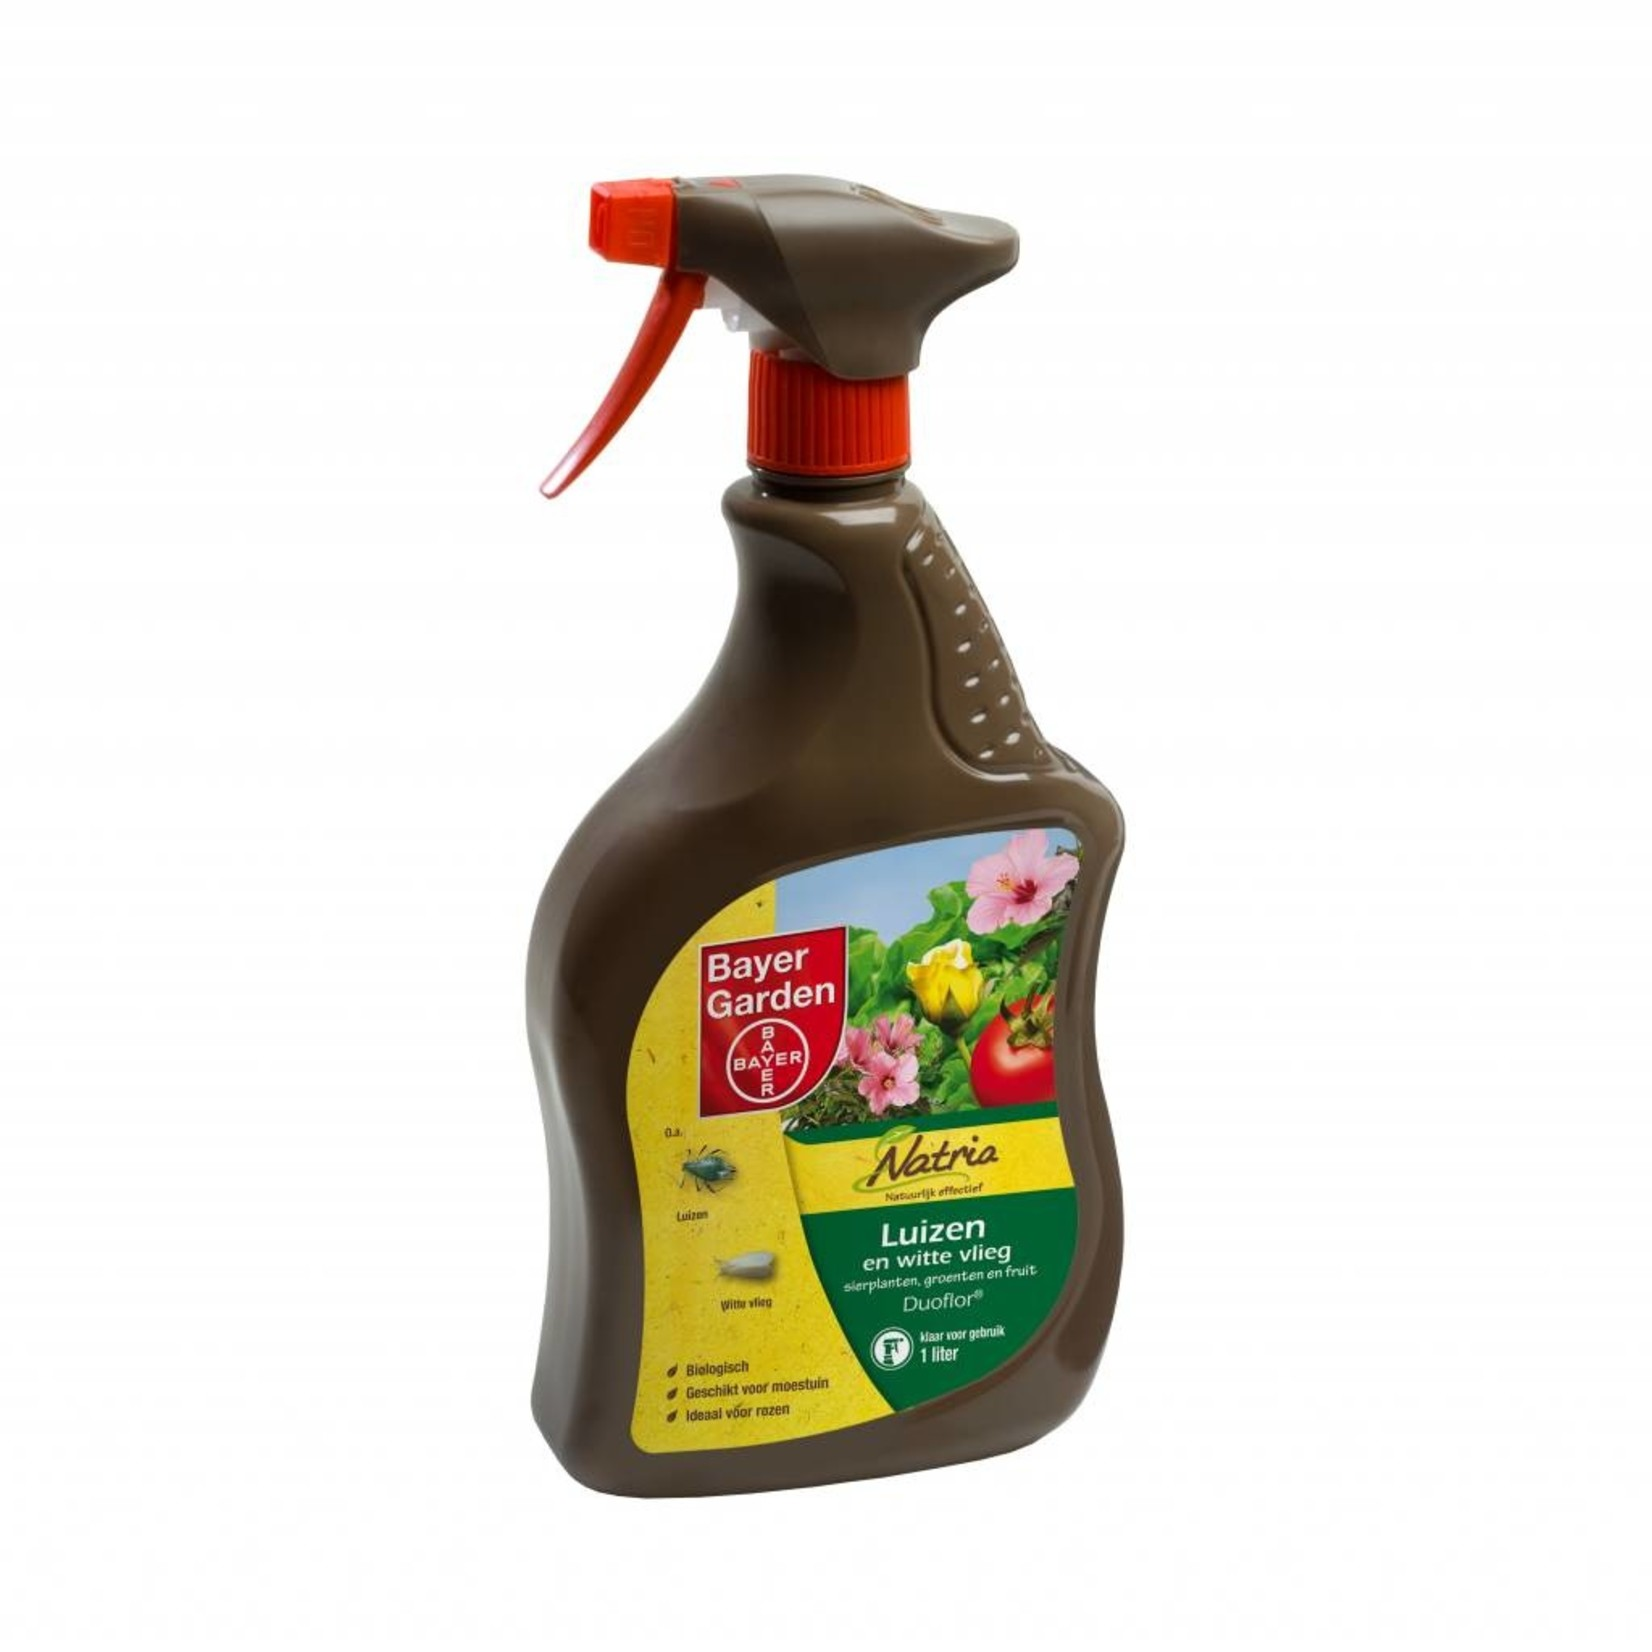 Bayer Garden Natria Duoflor spray tegen luizen en witte vlieg 1 Liter